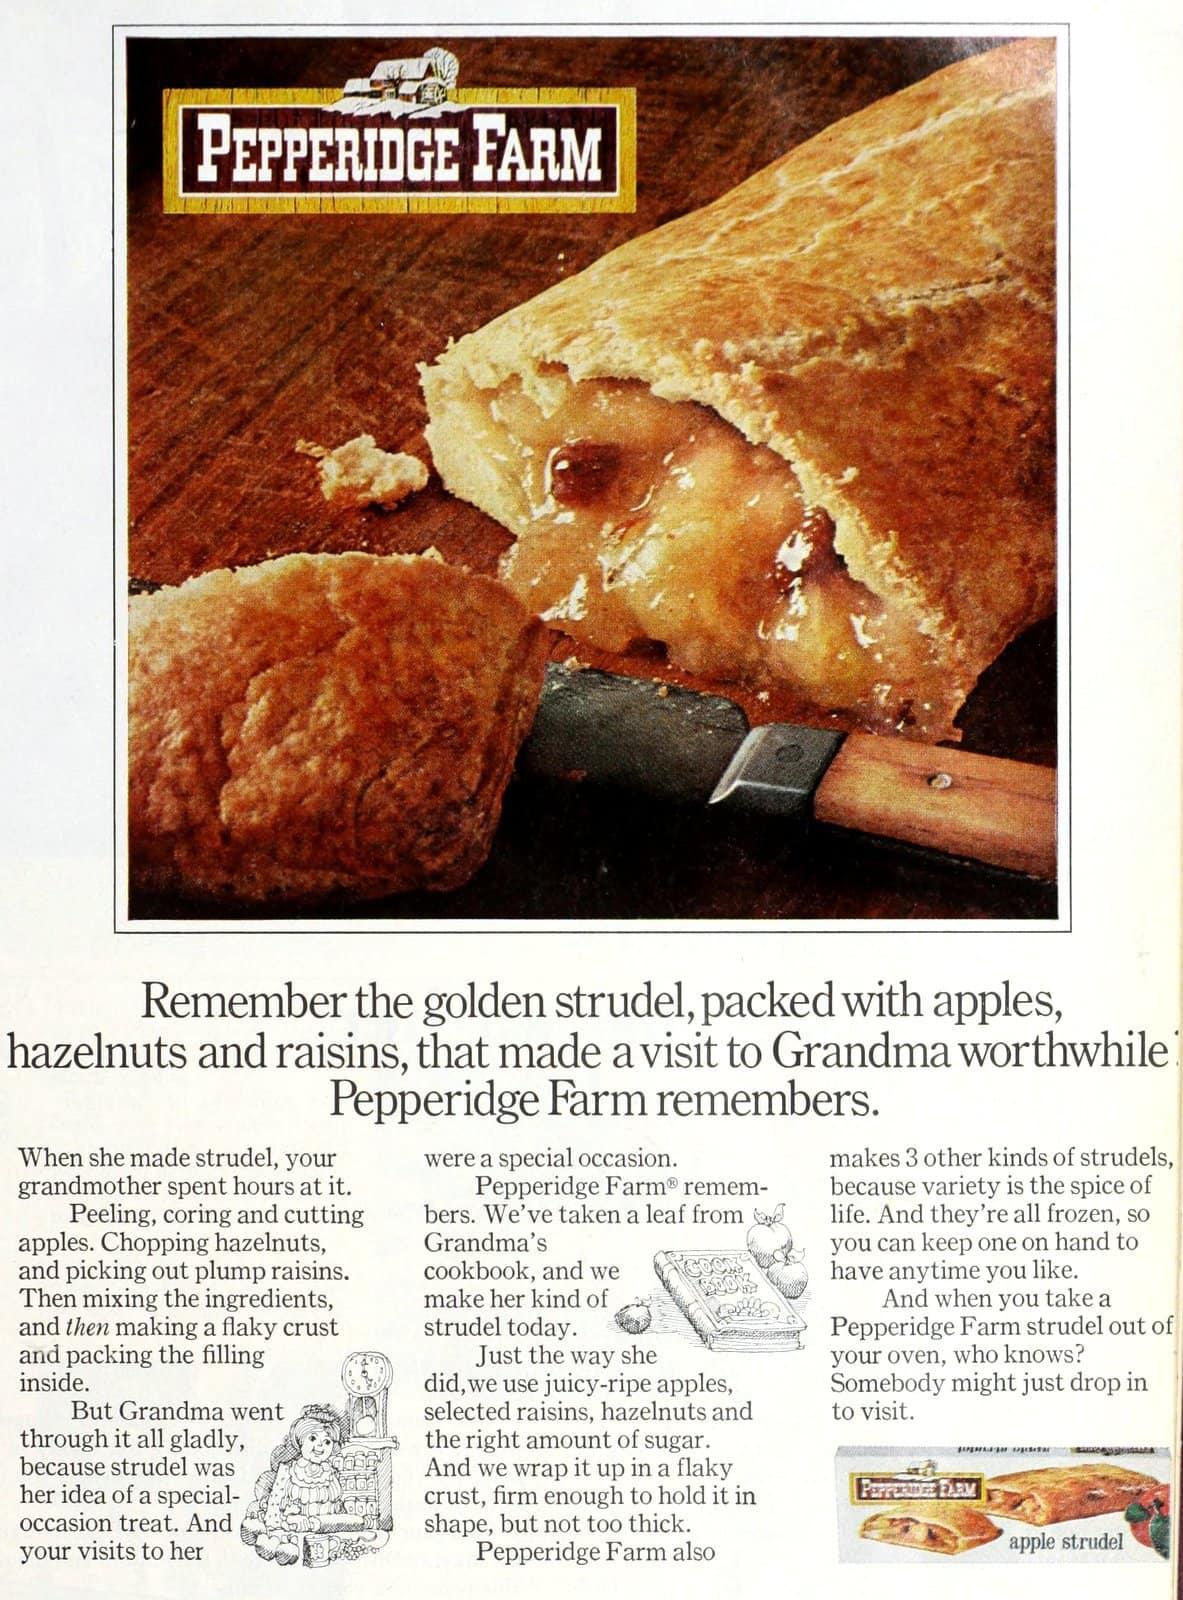 Vintage apple strudel from Pepperidge Farm (1969)